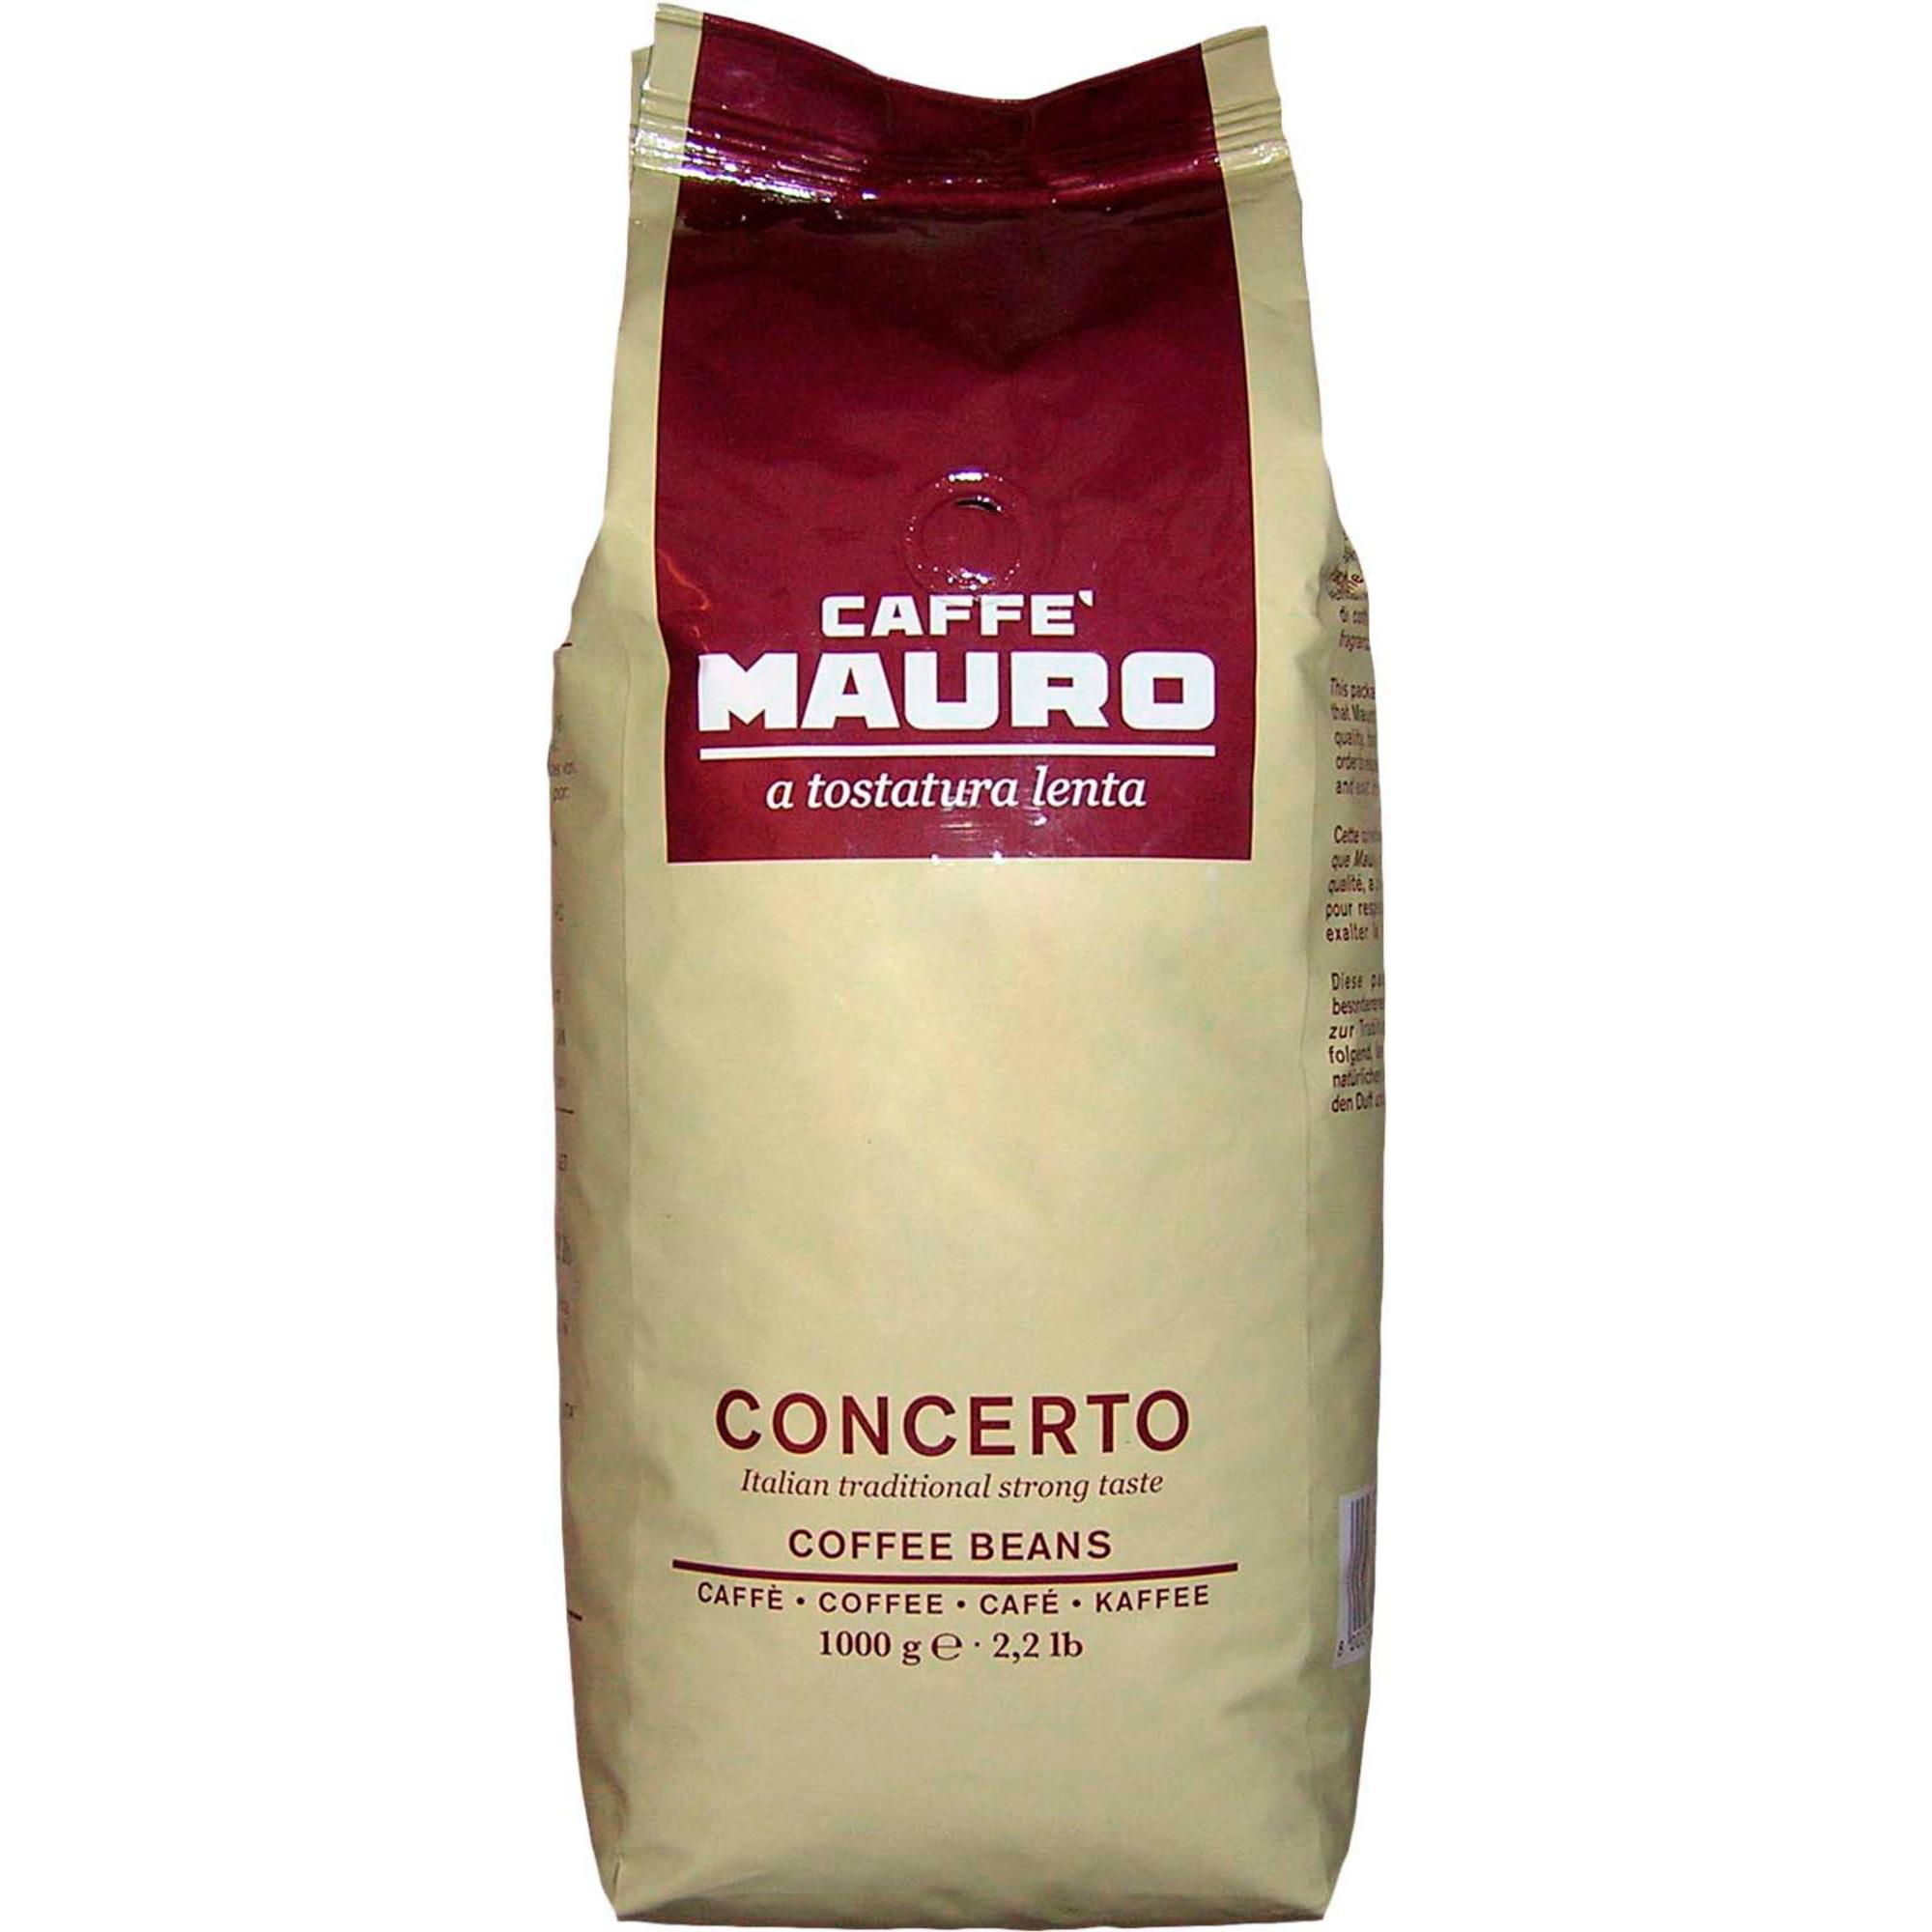 Caffè Mauro Caffè Mauro Concerto 1 Kg